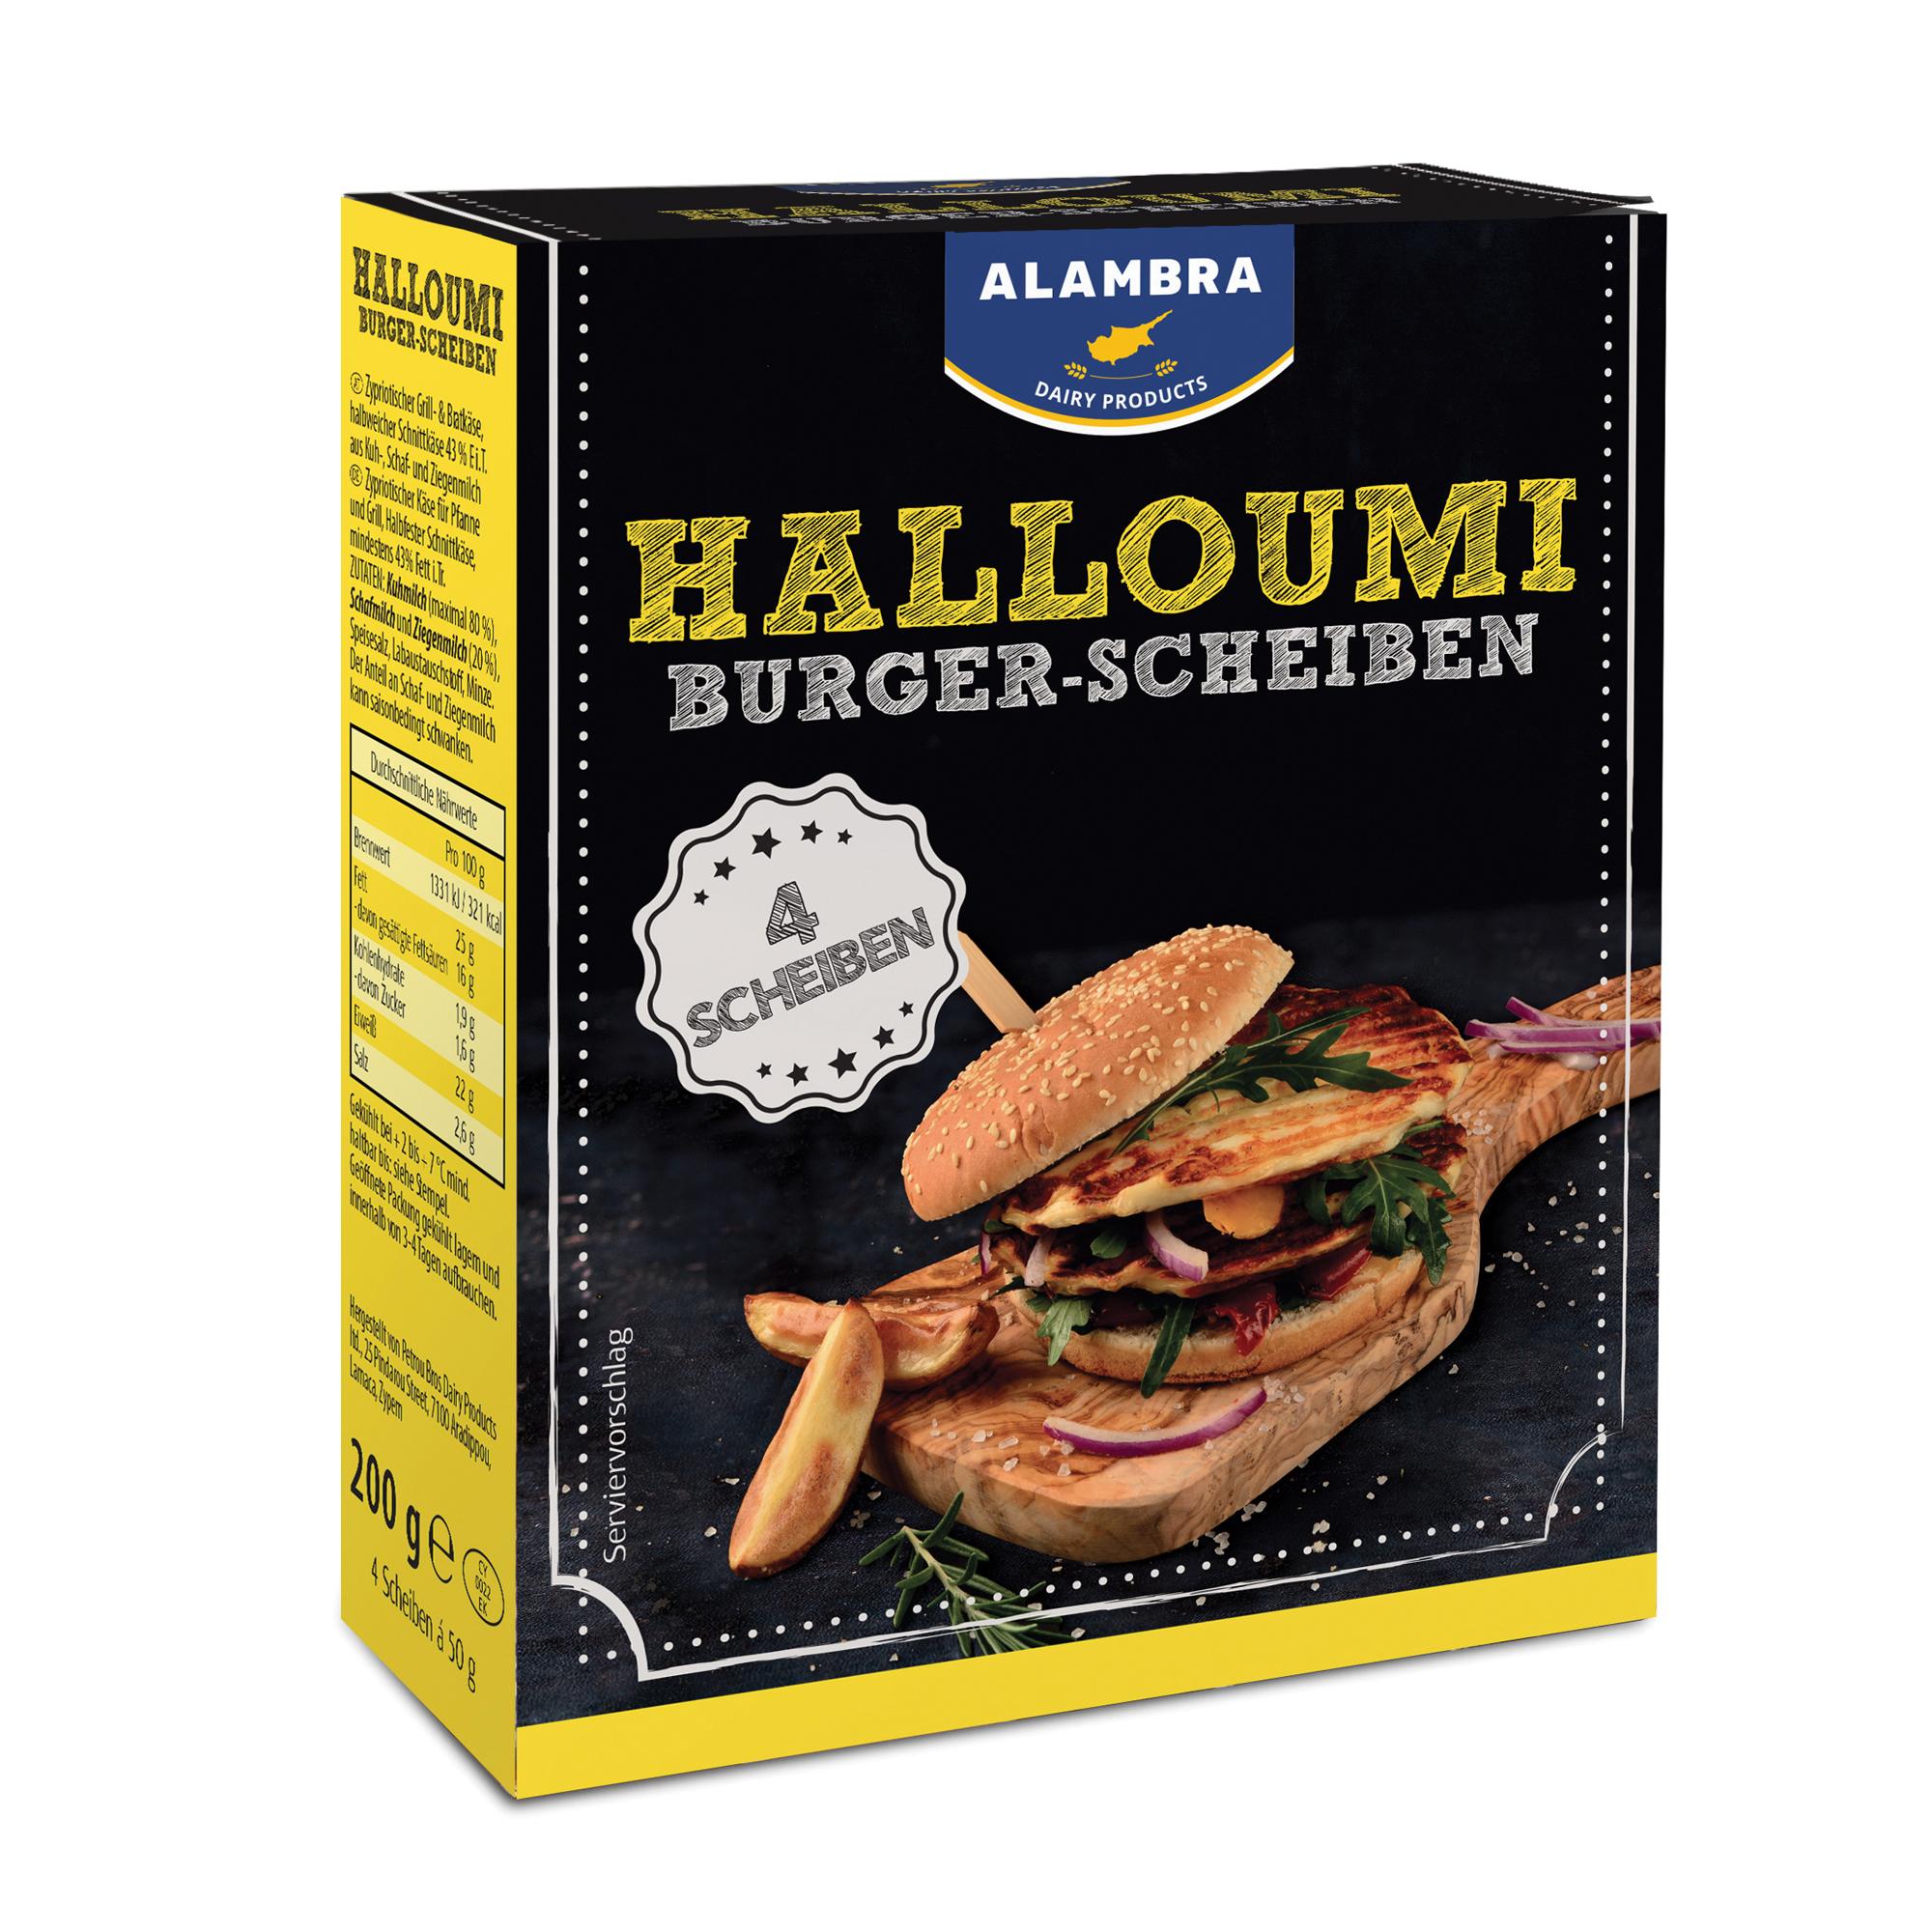 Halloumi Grillburger 200g